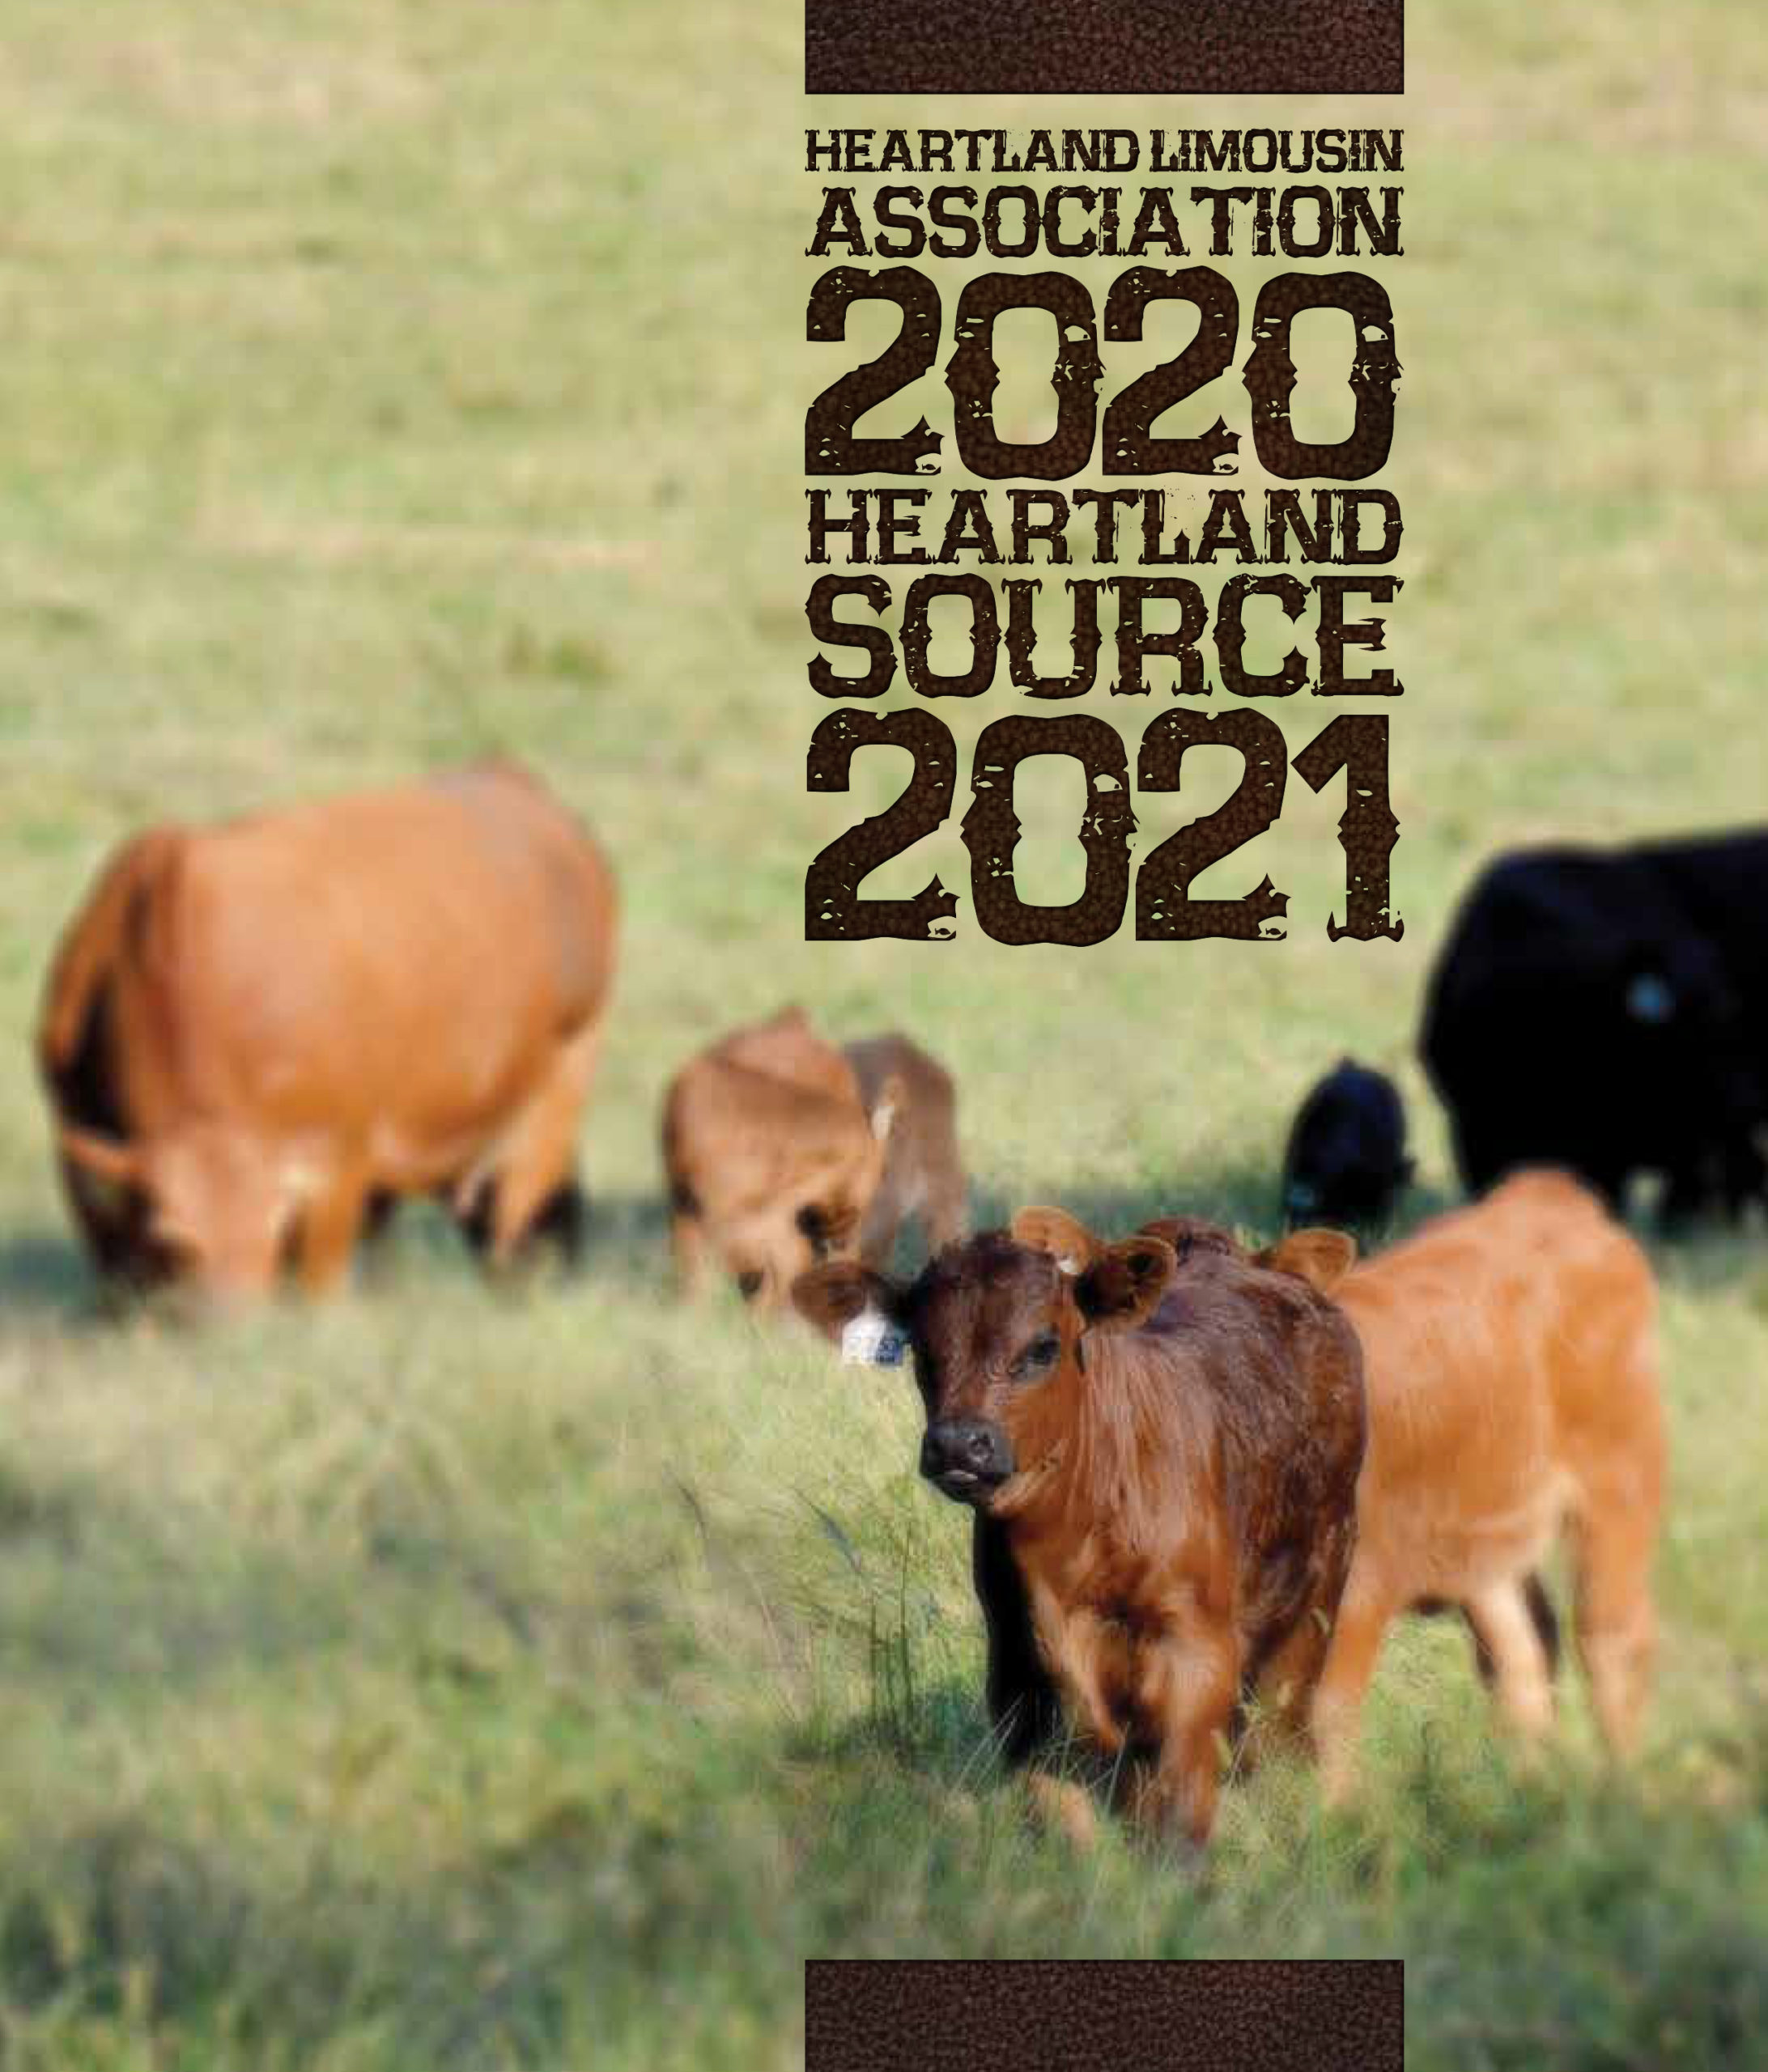 2020 Heartland Source